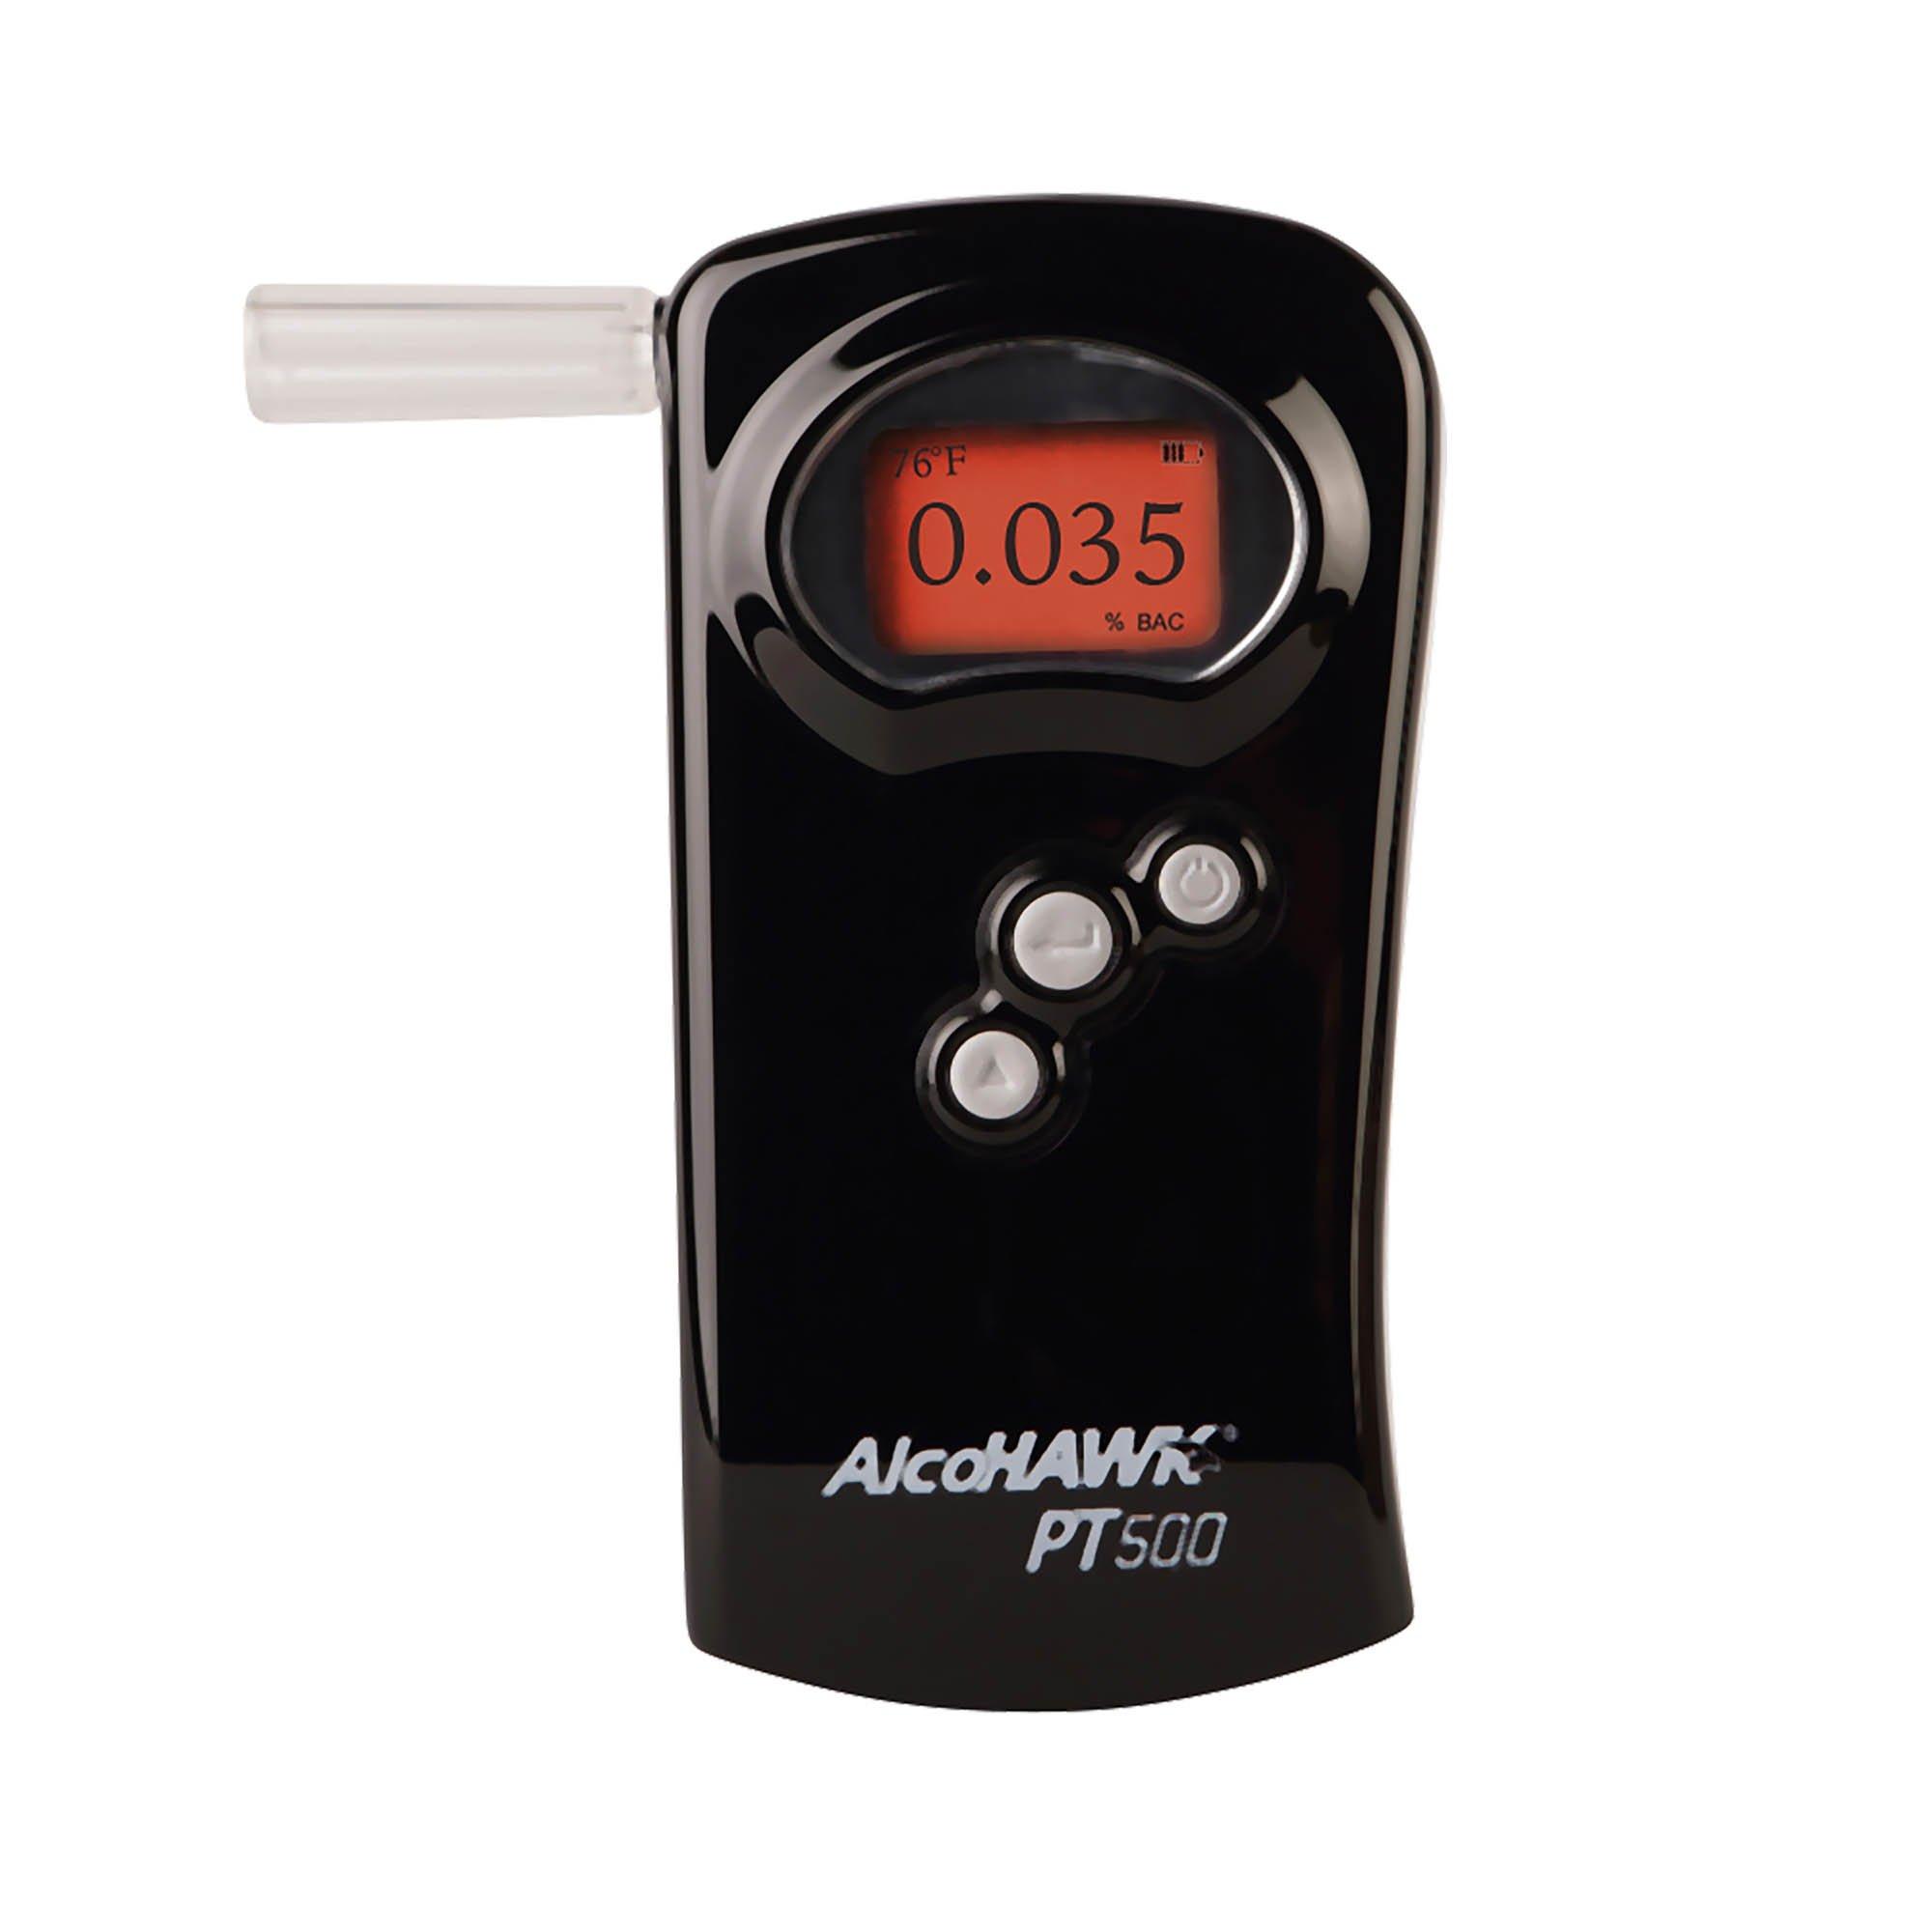 AlcoHAWK PT500 Breathalyzer Alcohol Detector